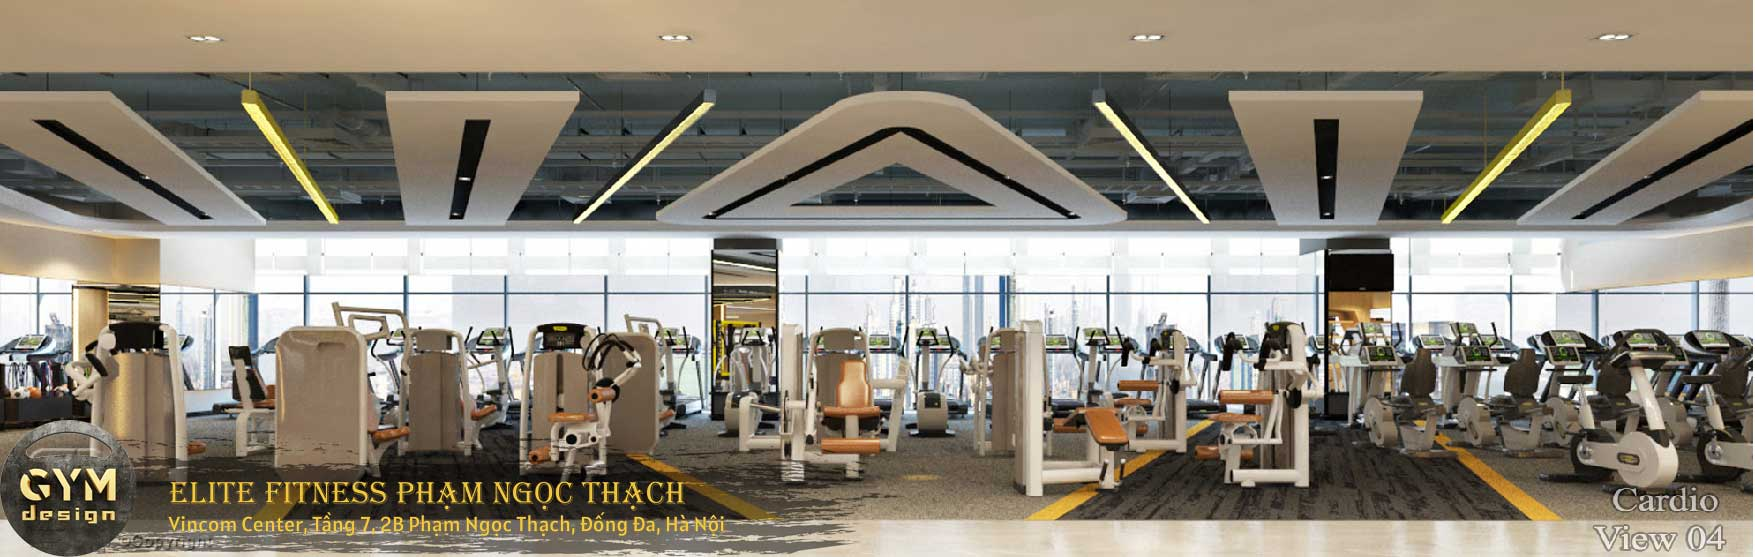 du-an-elite-fitness-pham-ngoc-thach-63